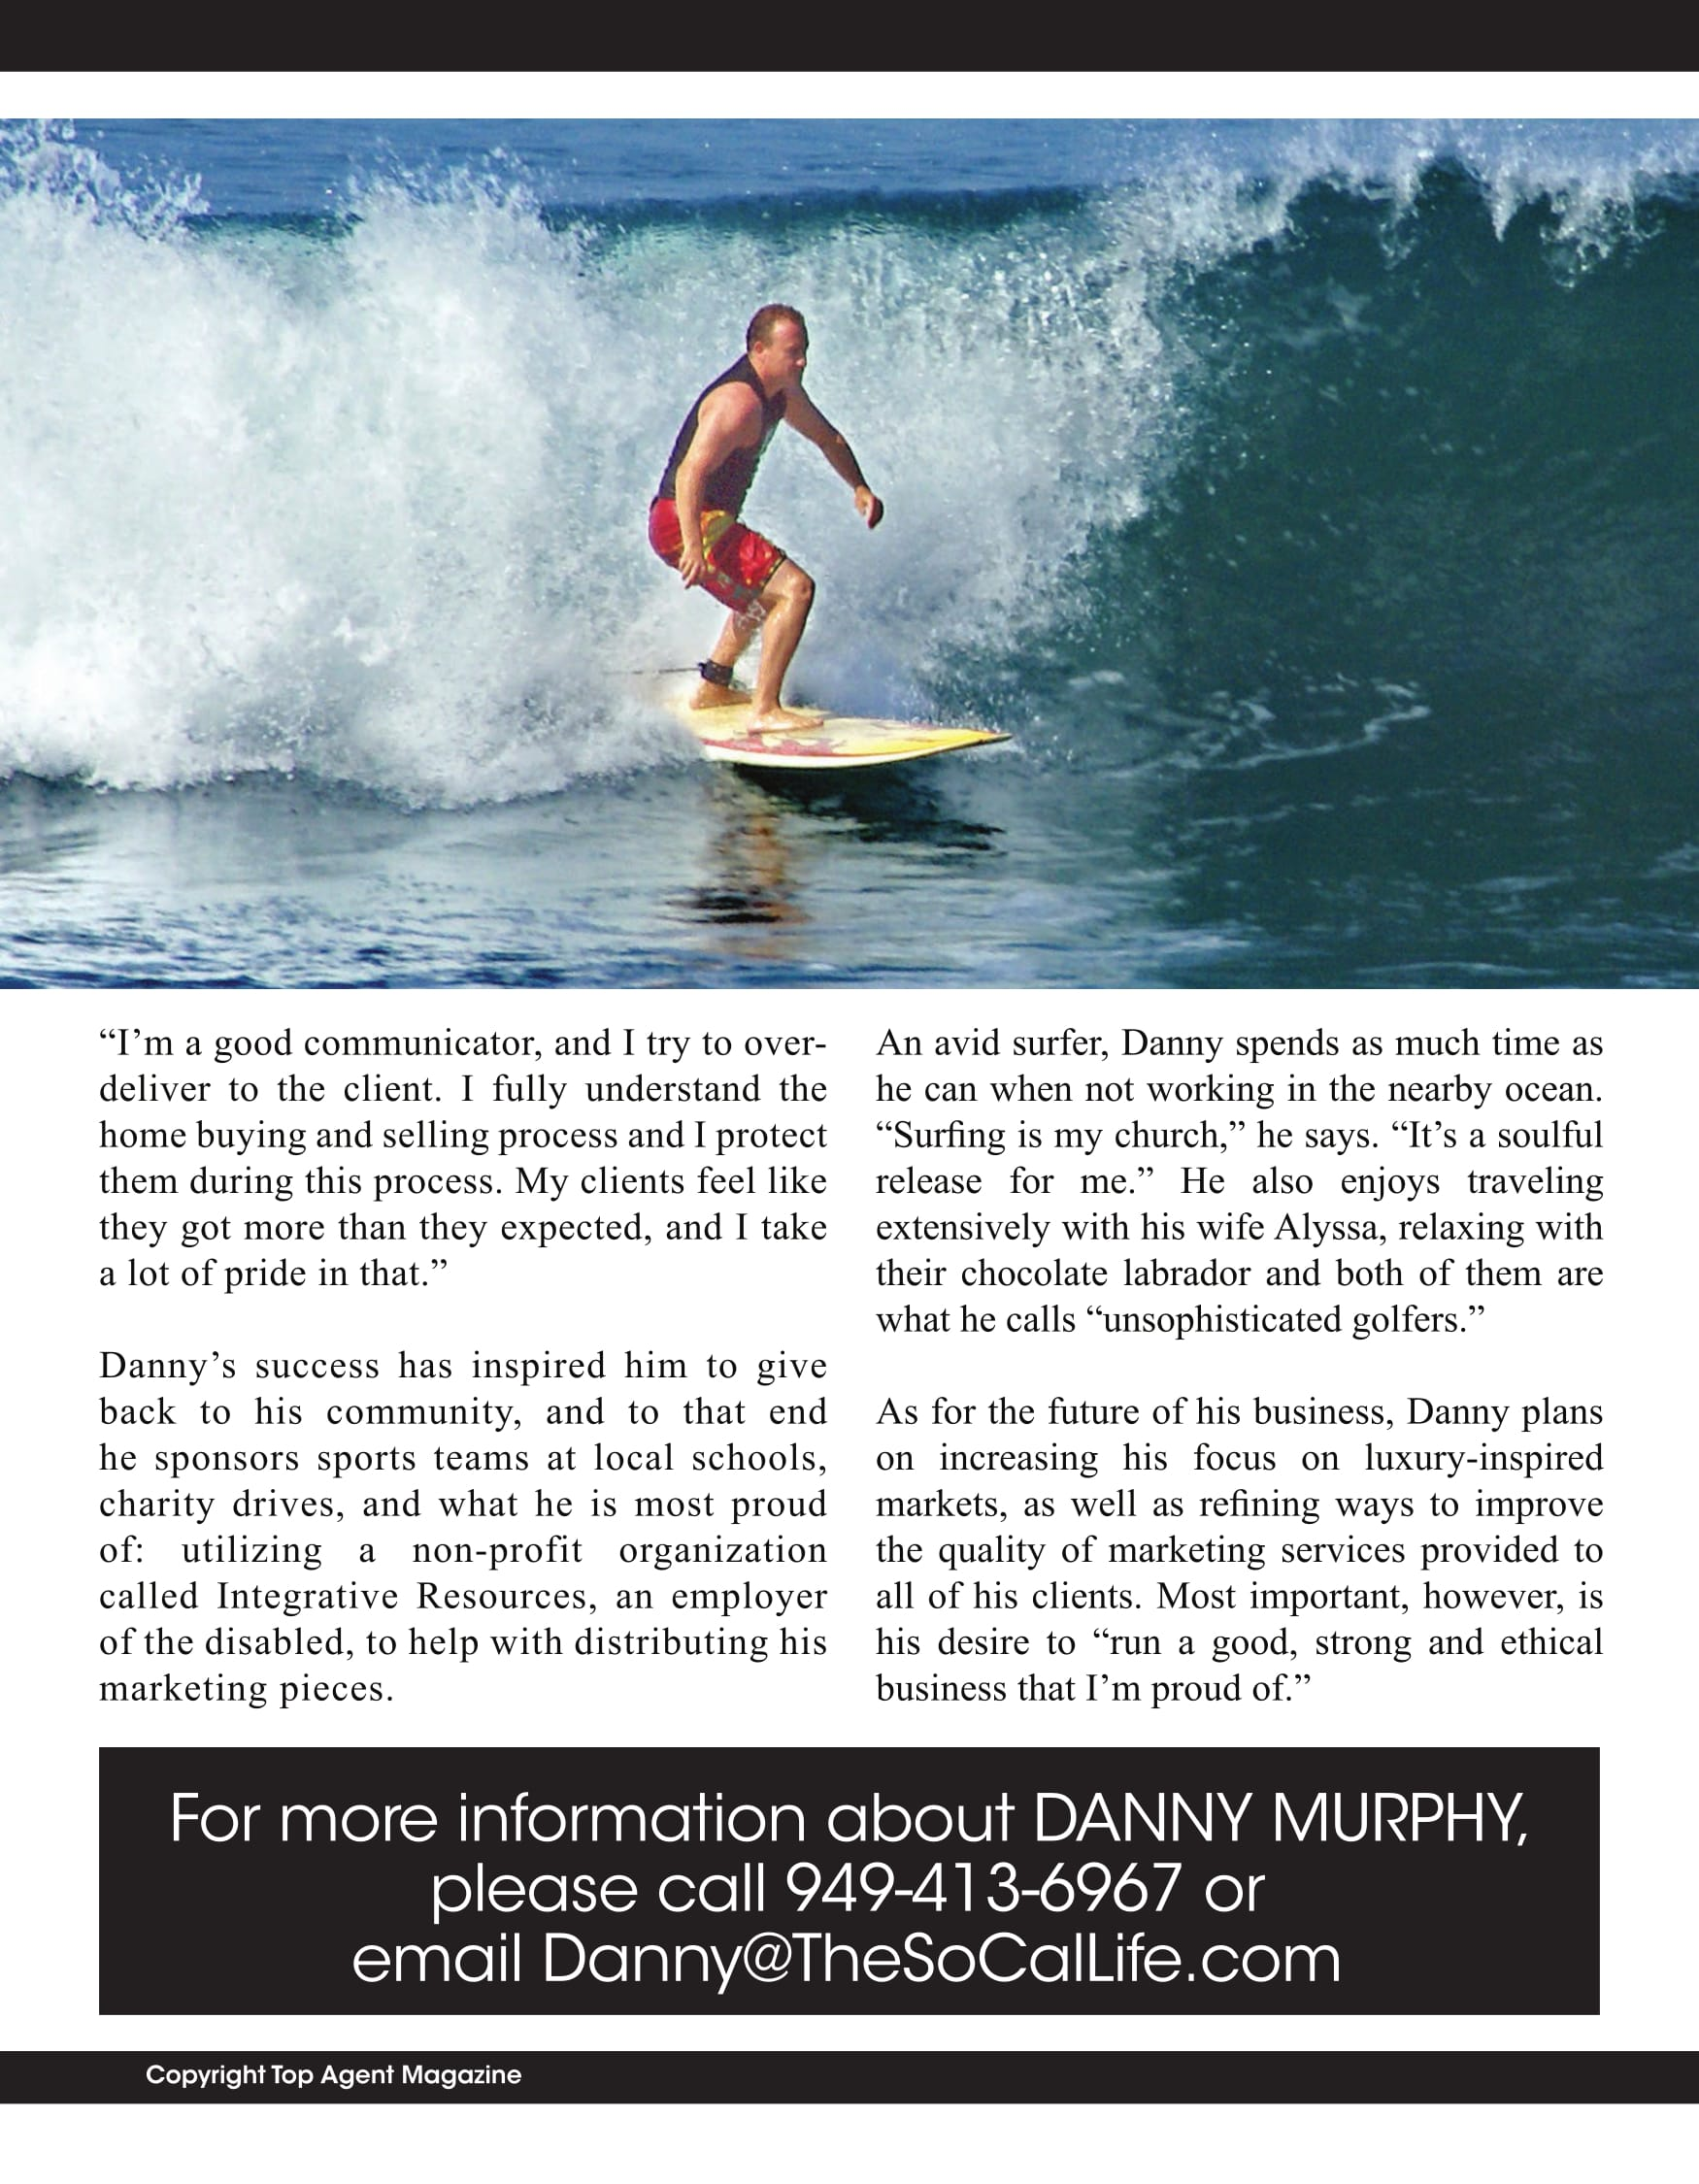 Top Agent Magazine article about Danny Murphy & Associates, top realtor in Newport Beach, Ca